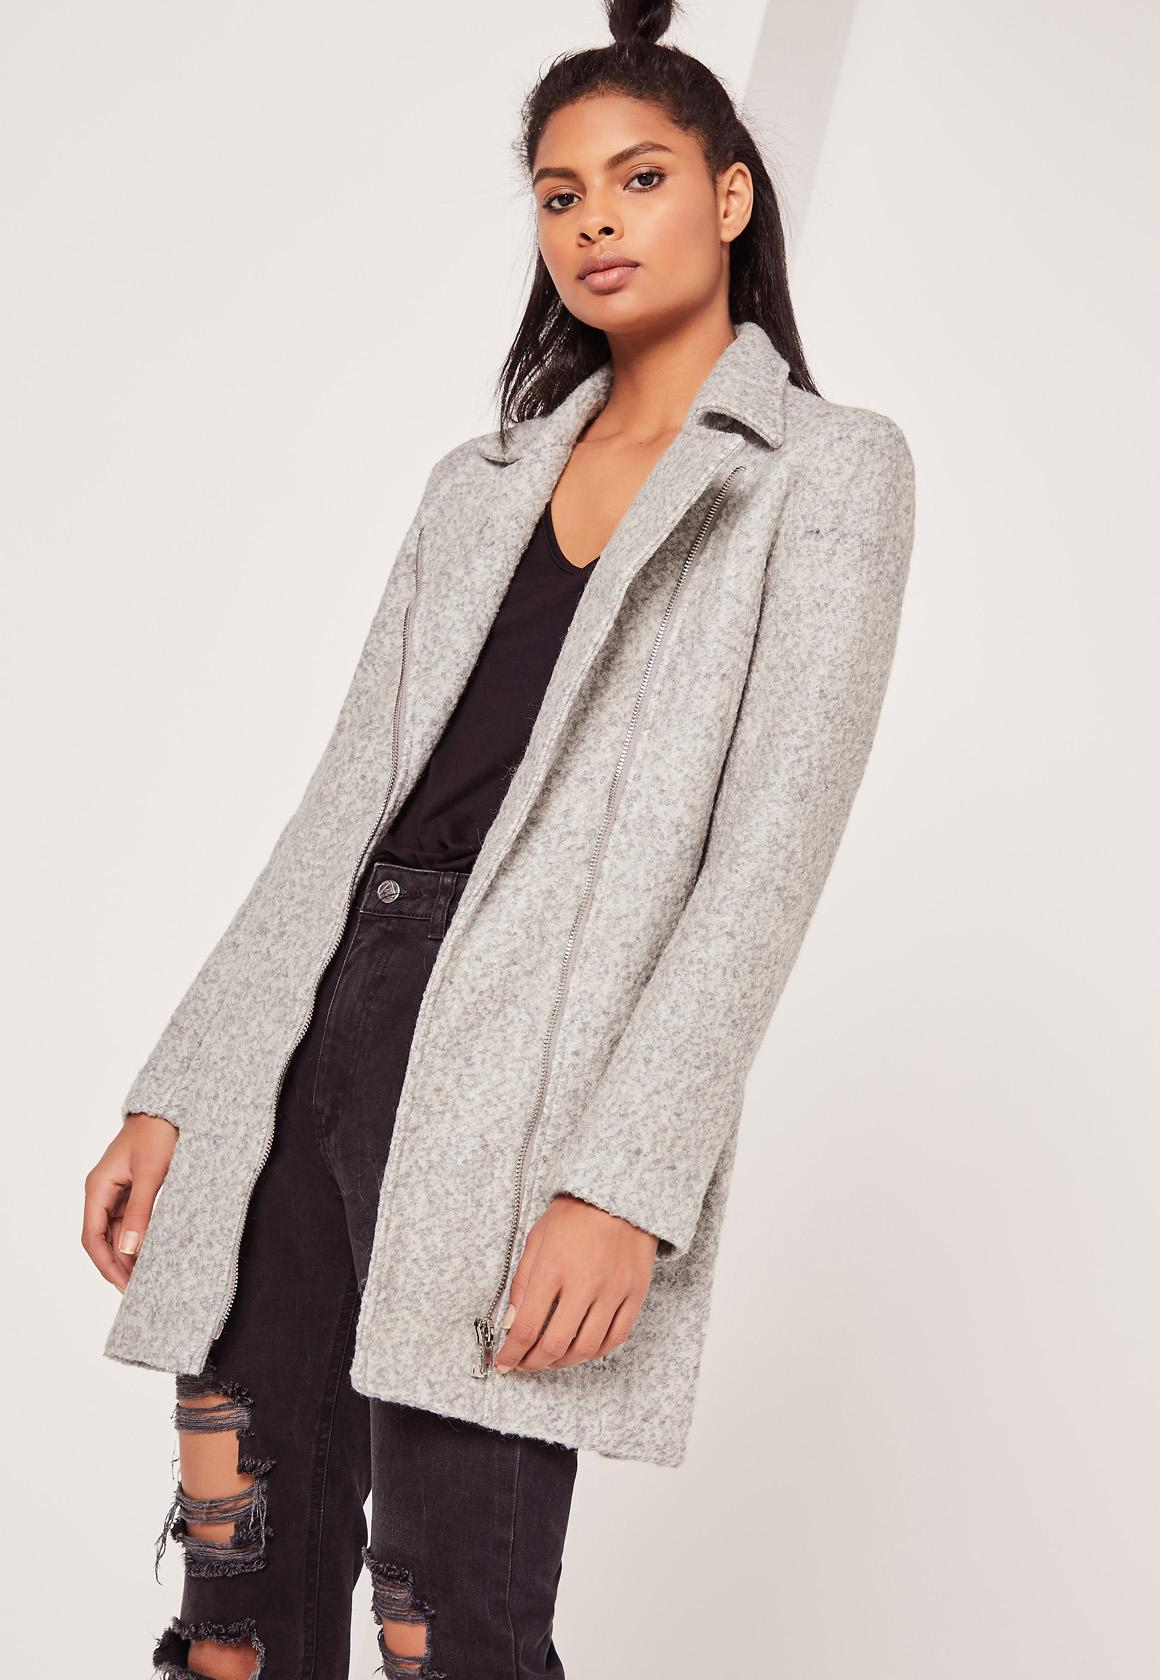 Petite veste laine femme